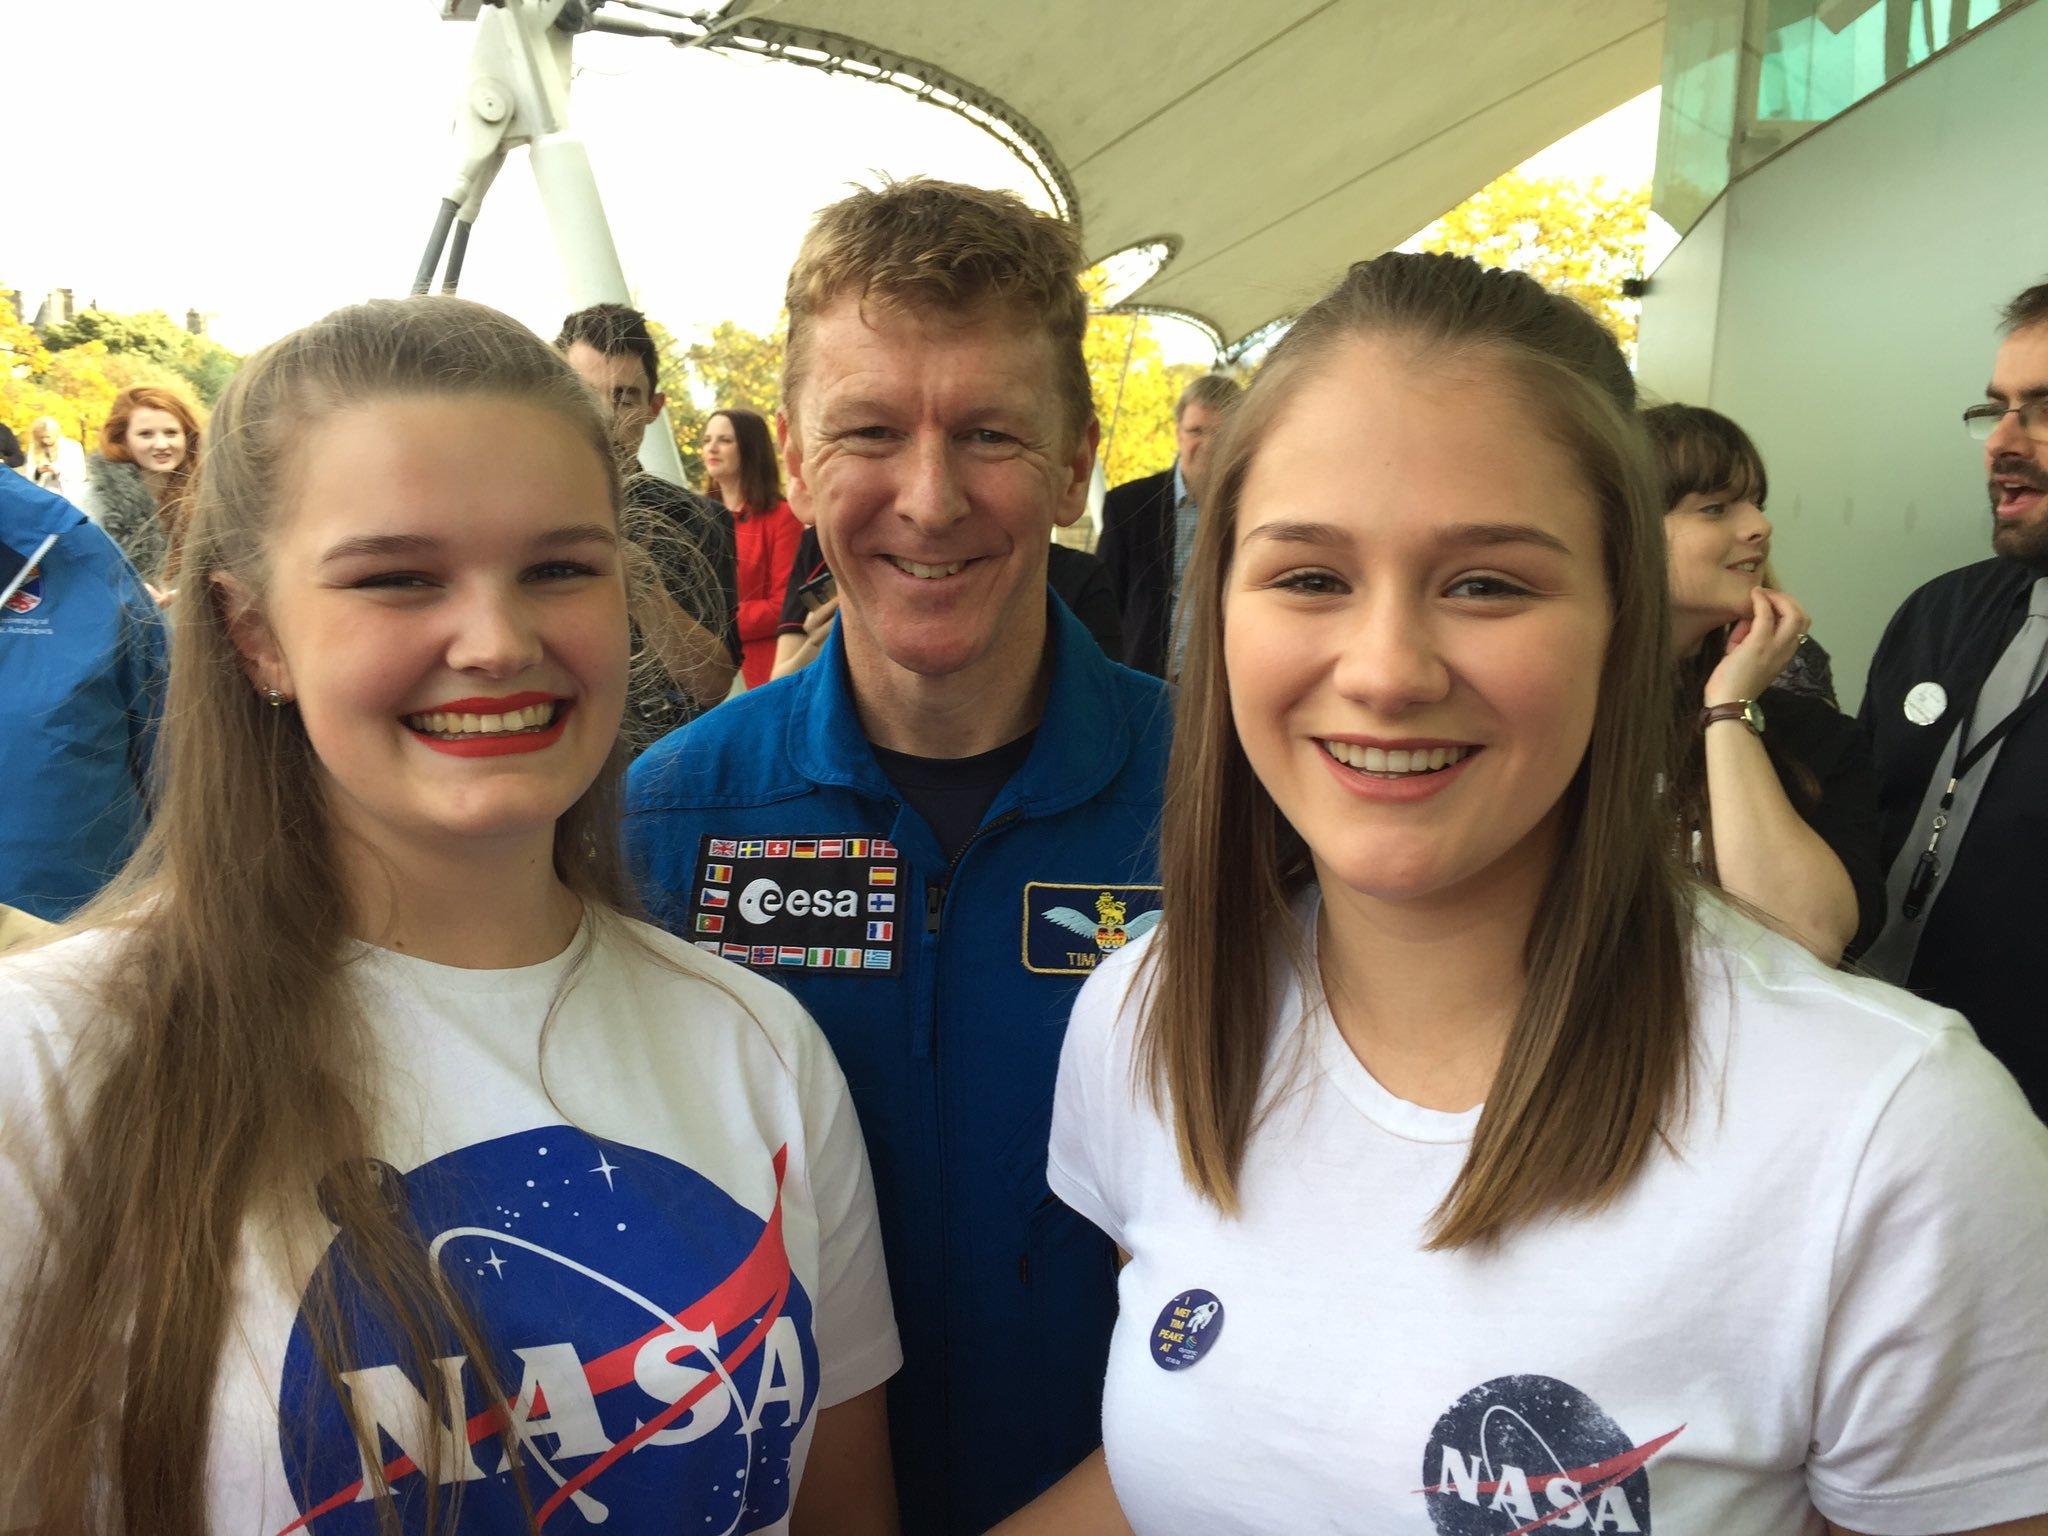 Elgin High School pupils Kirtsen Flett, left, and Ellen O'Hare, right, meet astronaut Tim Peake in Edinburgh.